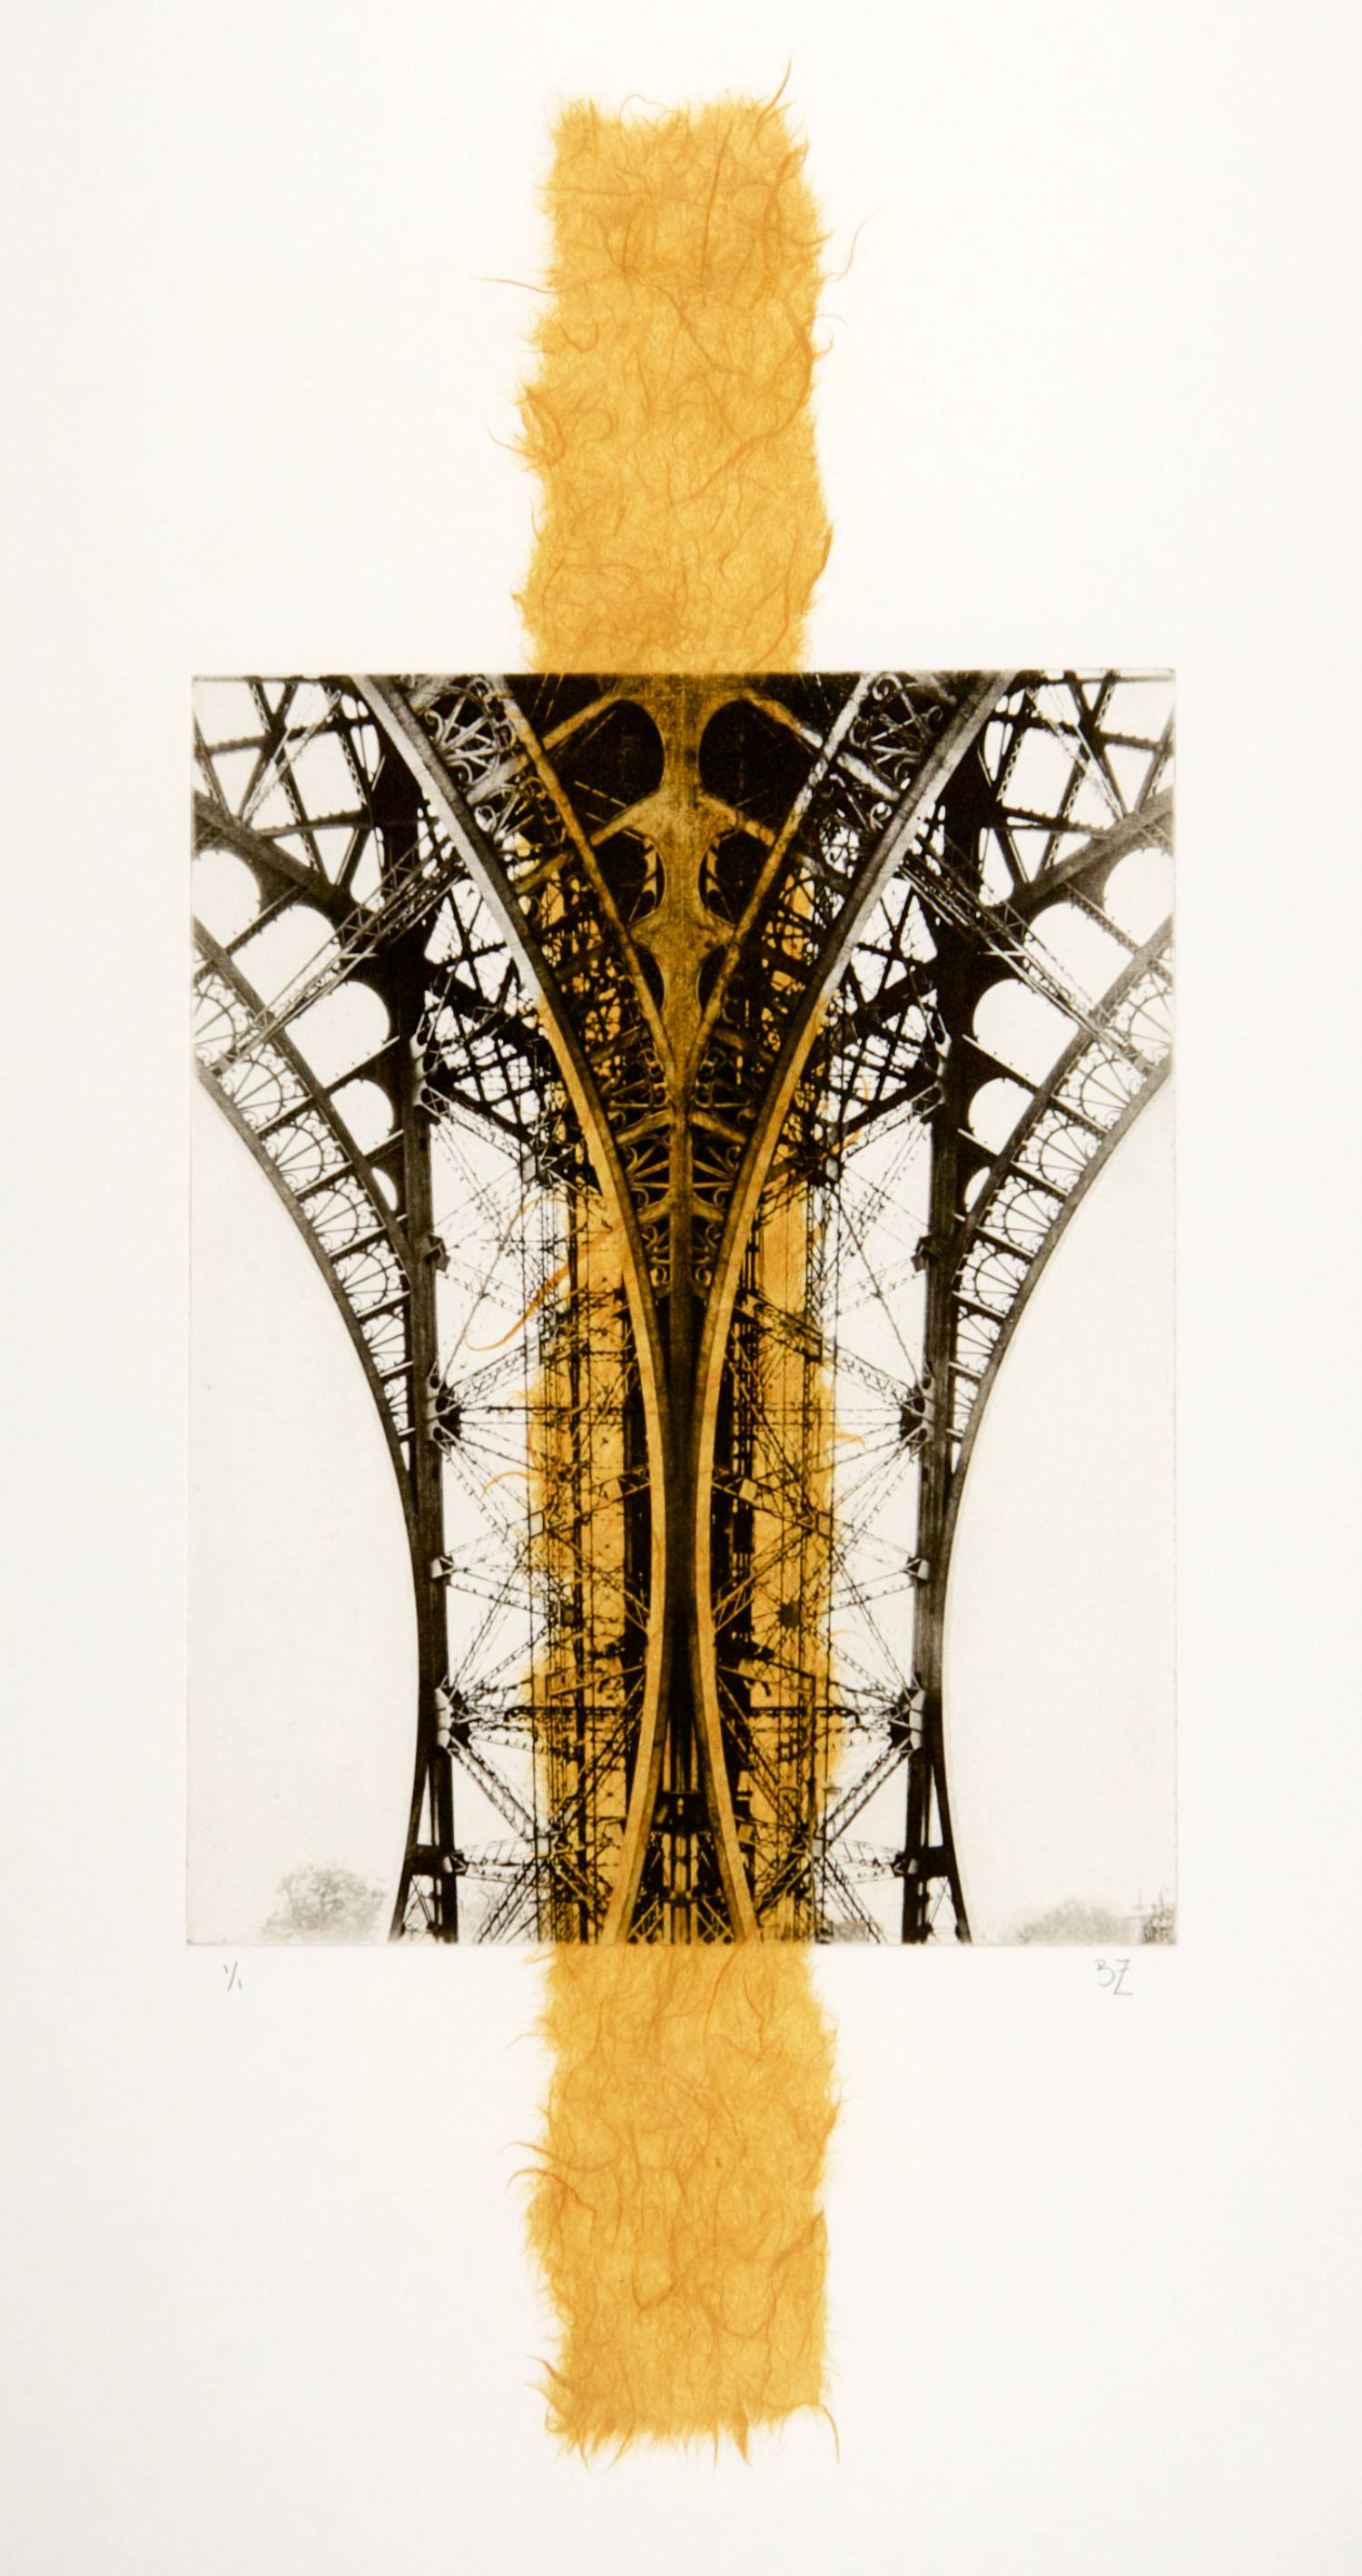 Eiffel chine-collé (mango)